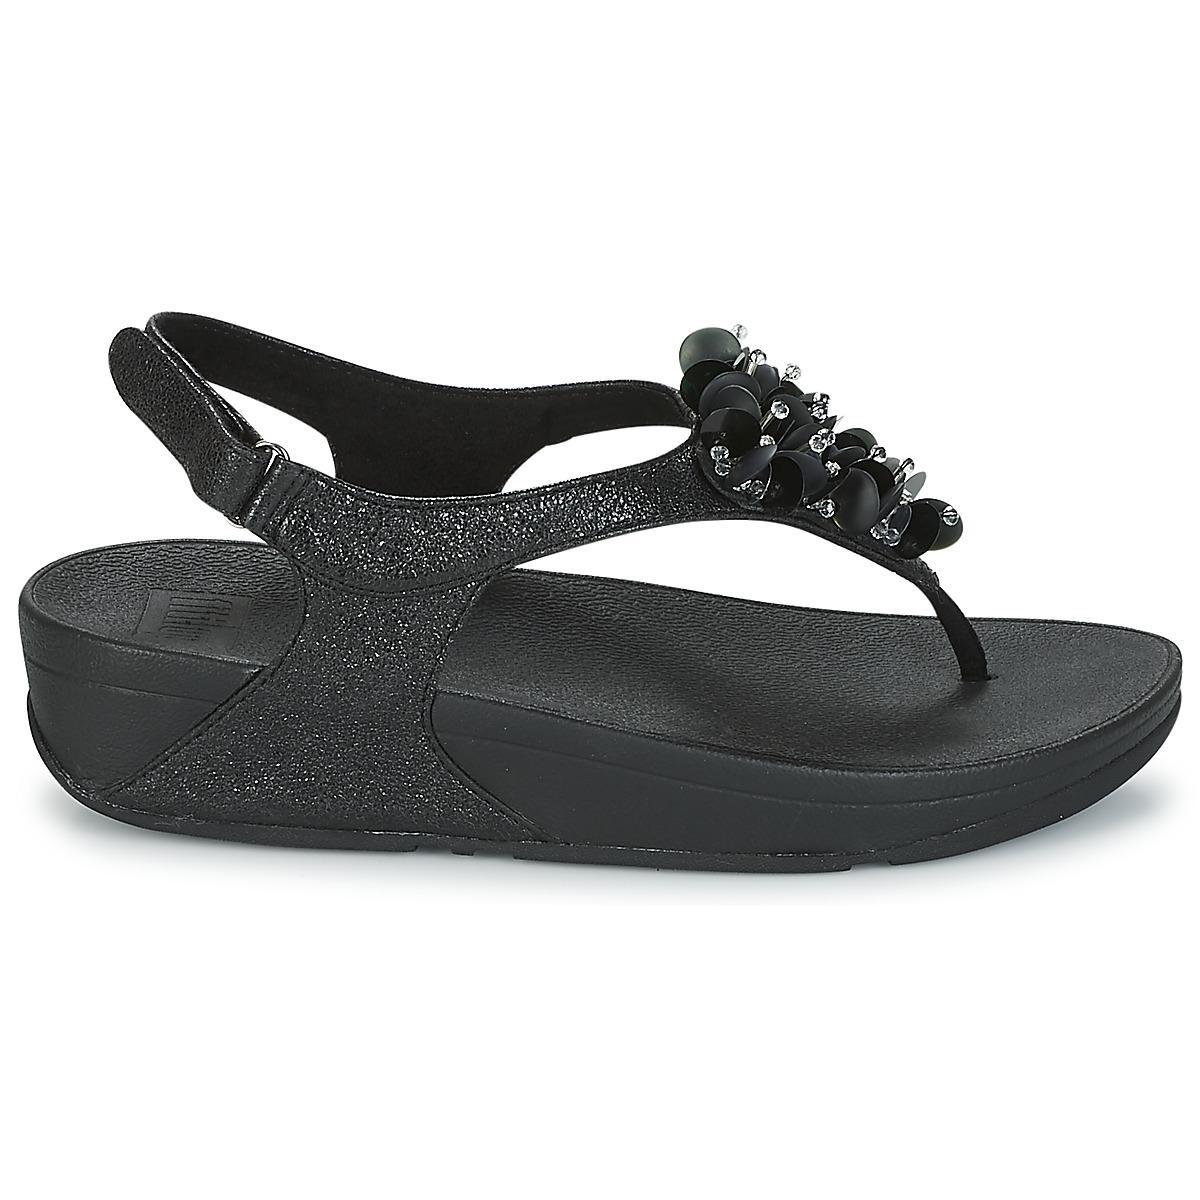 9ed0935a959 Fitflop - Black Boogaloo Back Strap Sandal Sandals - Lyst. View fullscreen